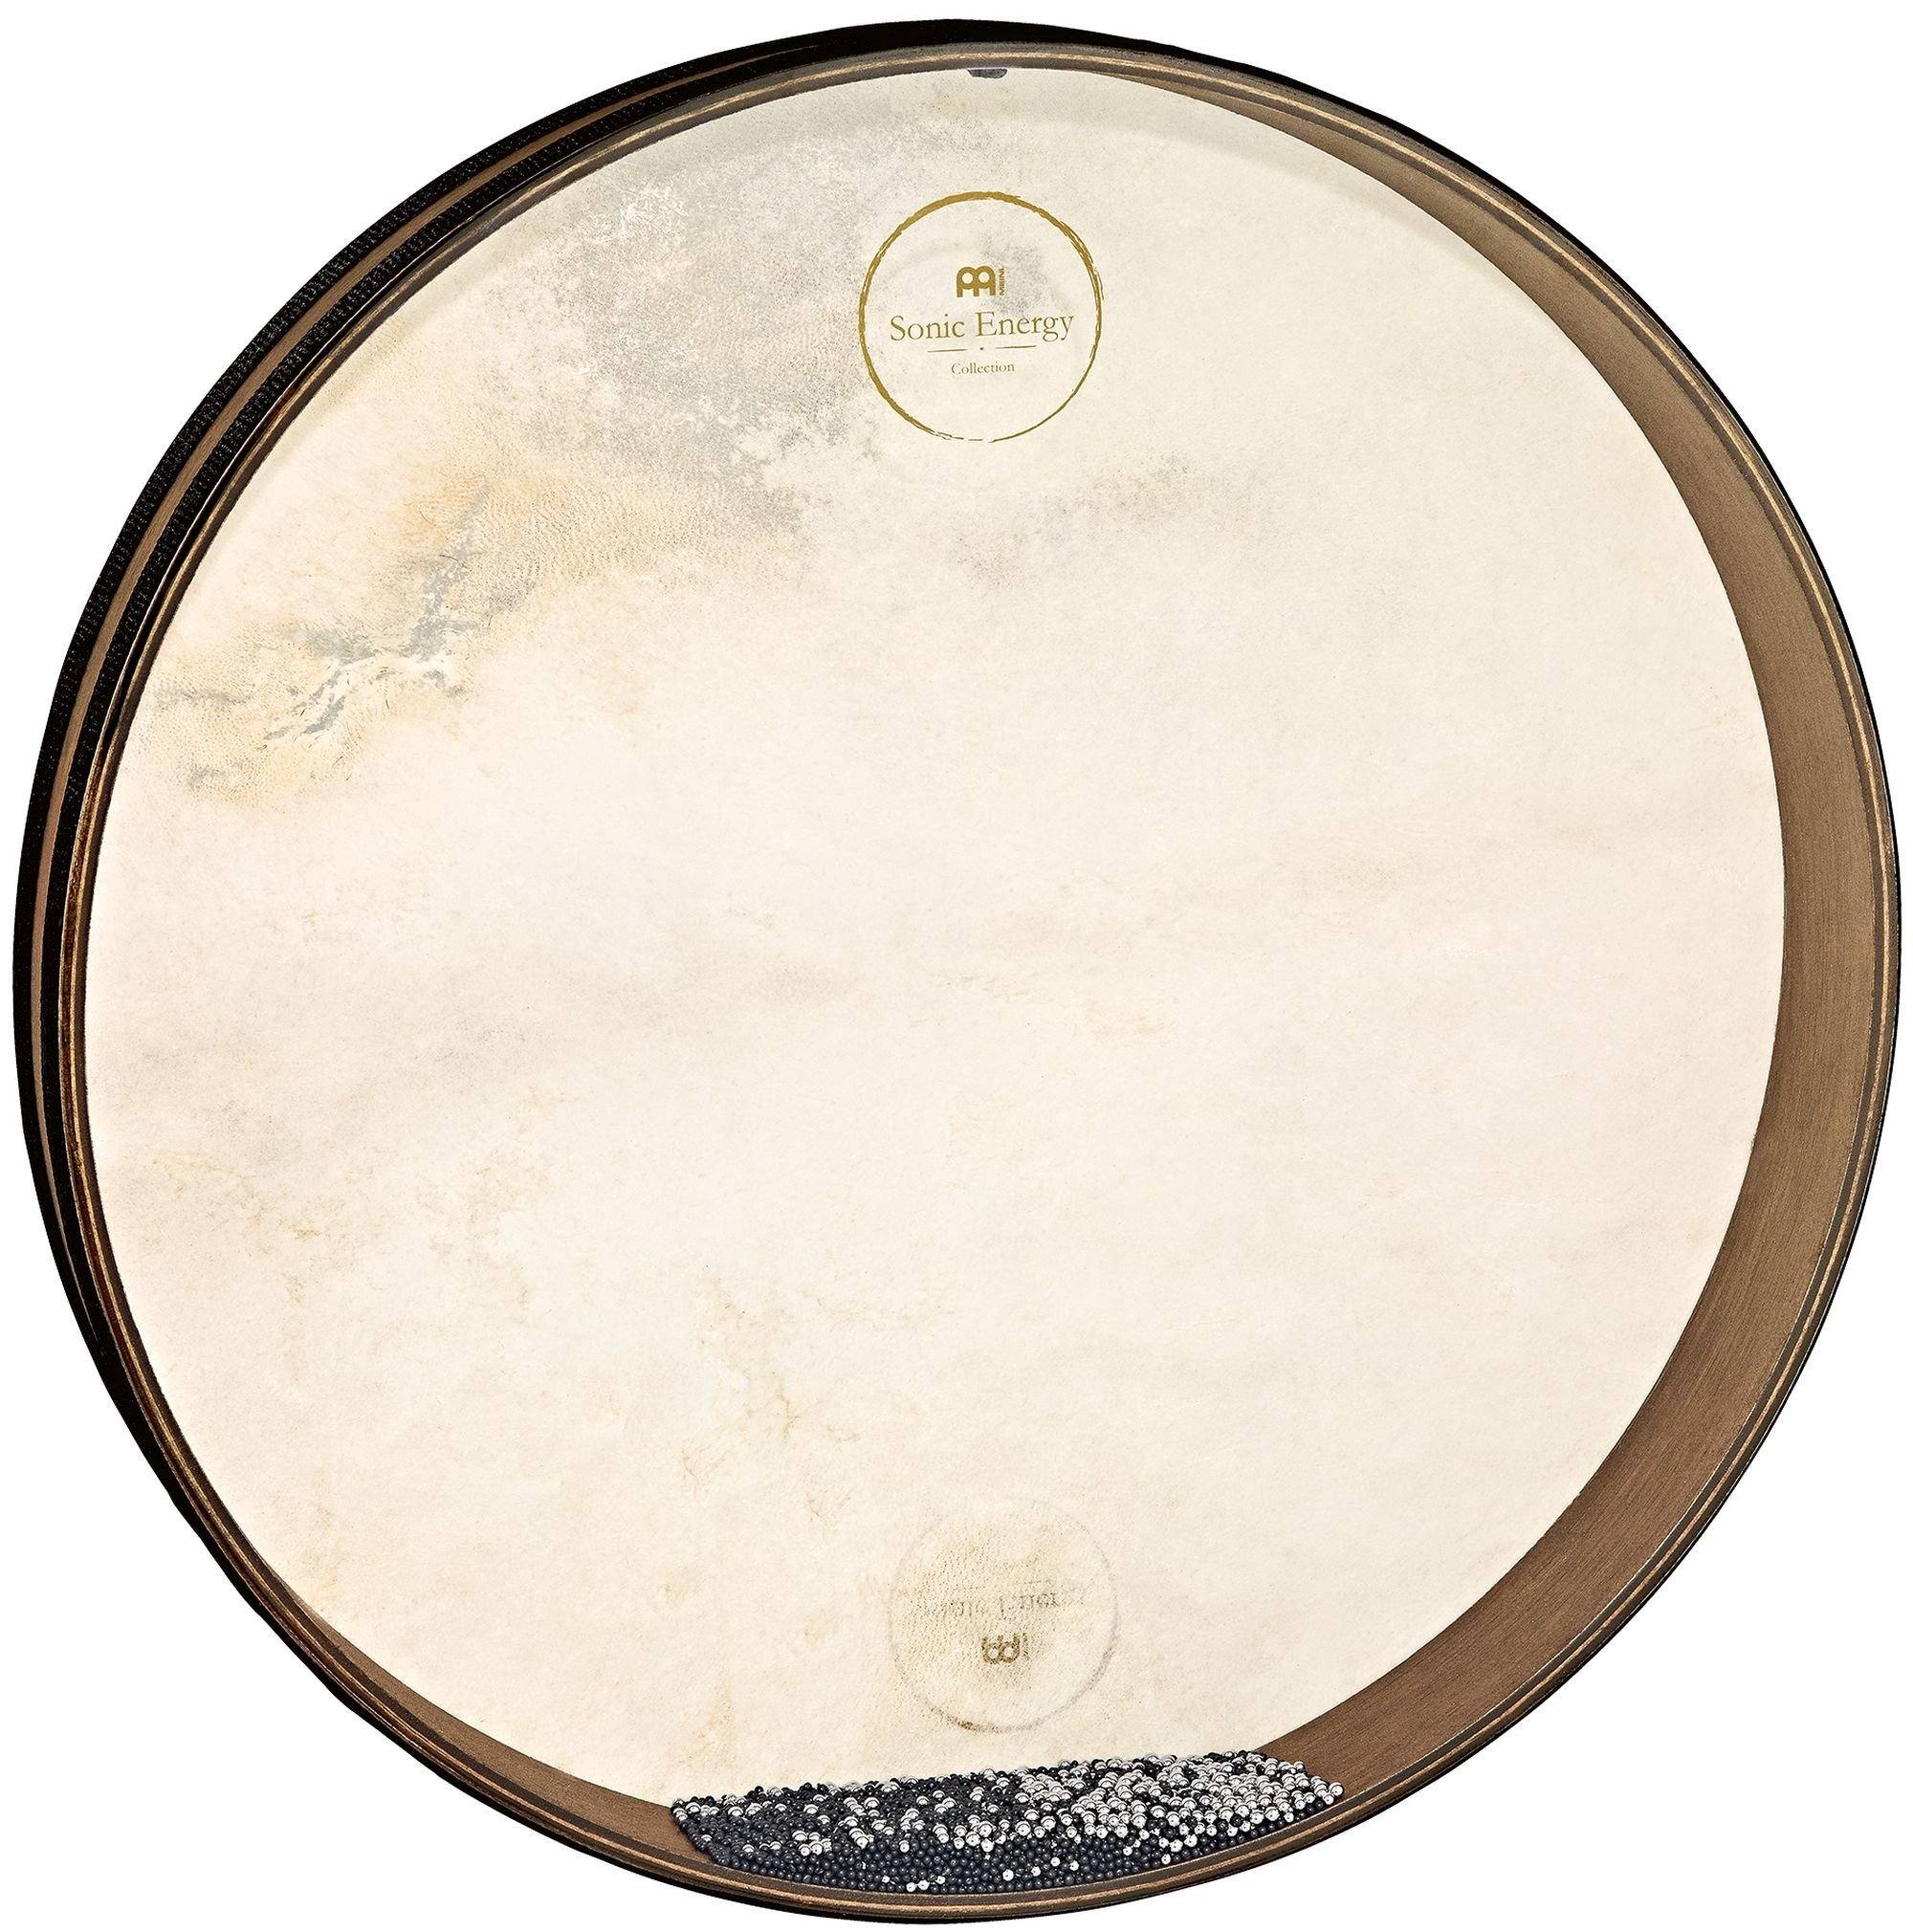 Meinl Sonic Energy WD18WB 18-Inch Wave Drum, Walnut Brown